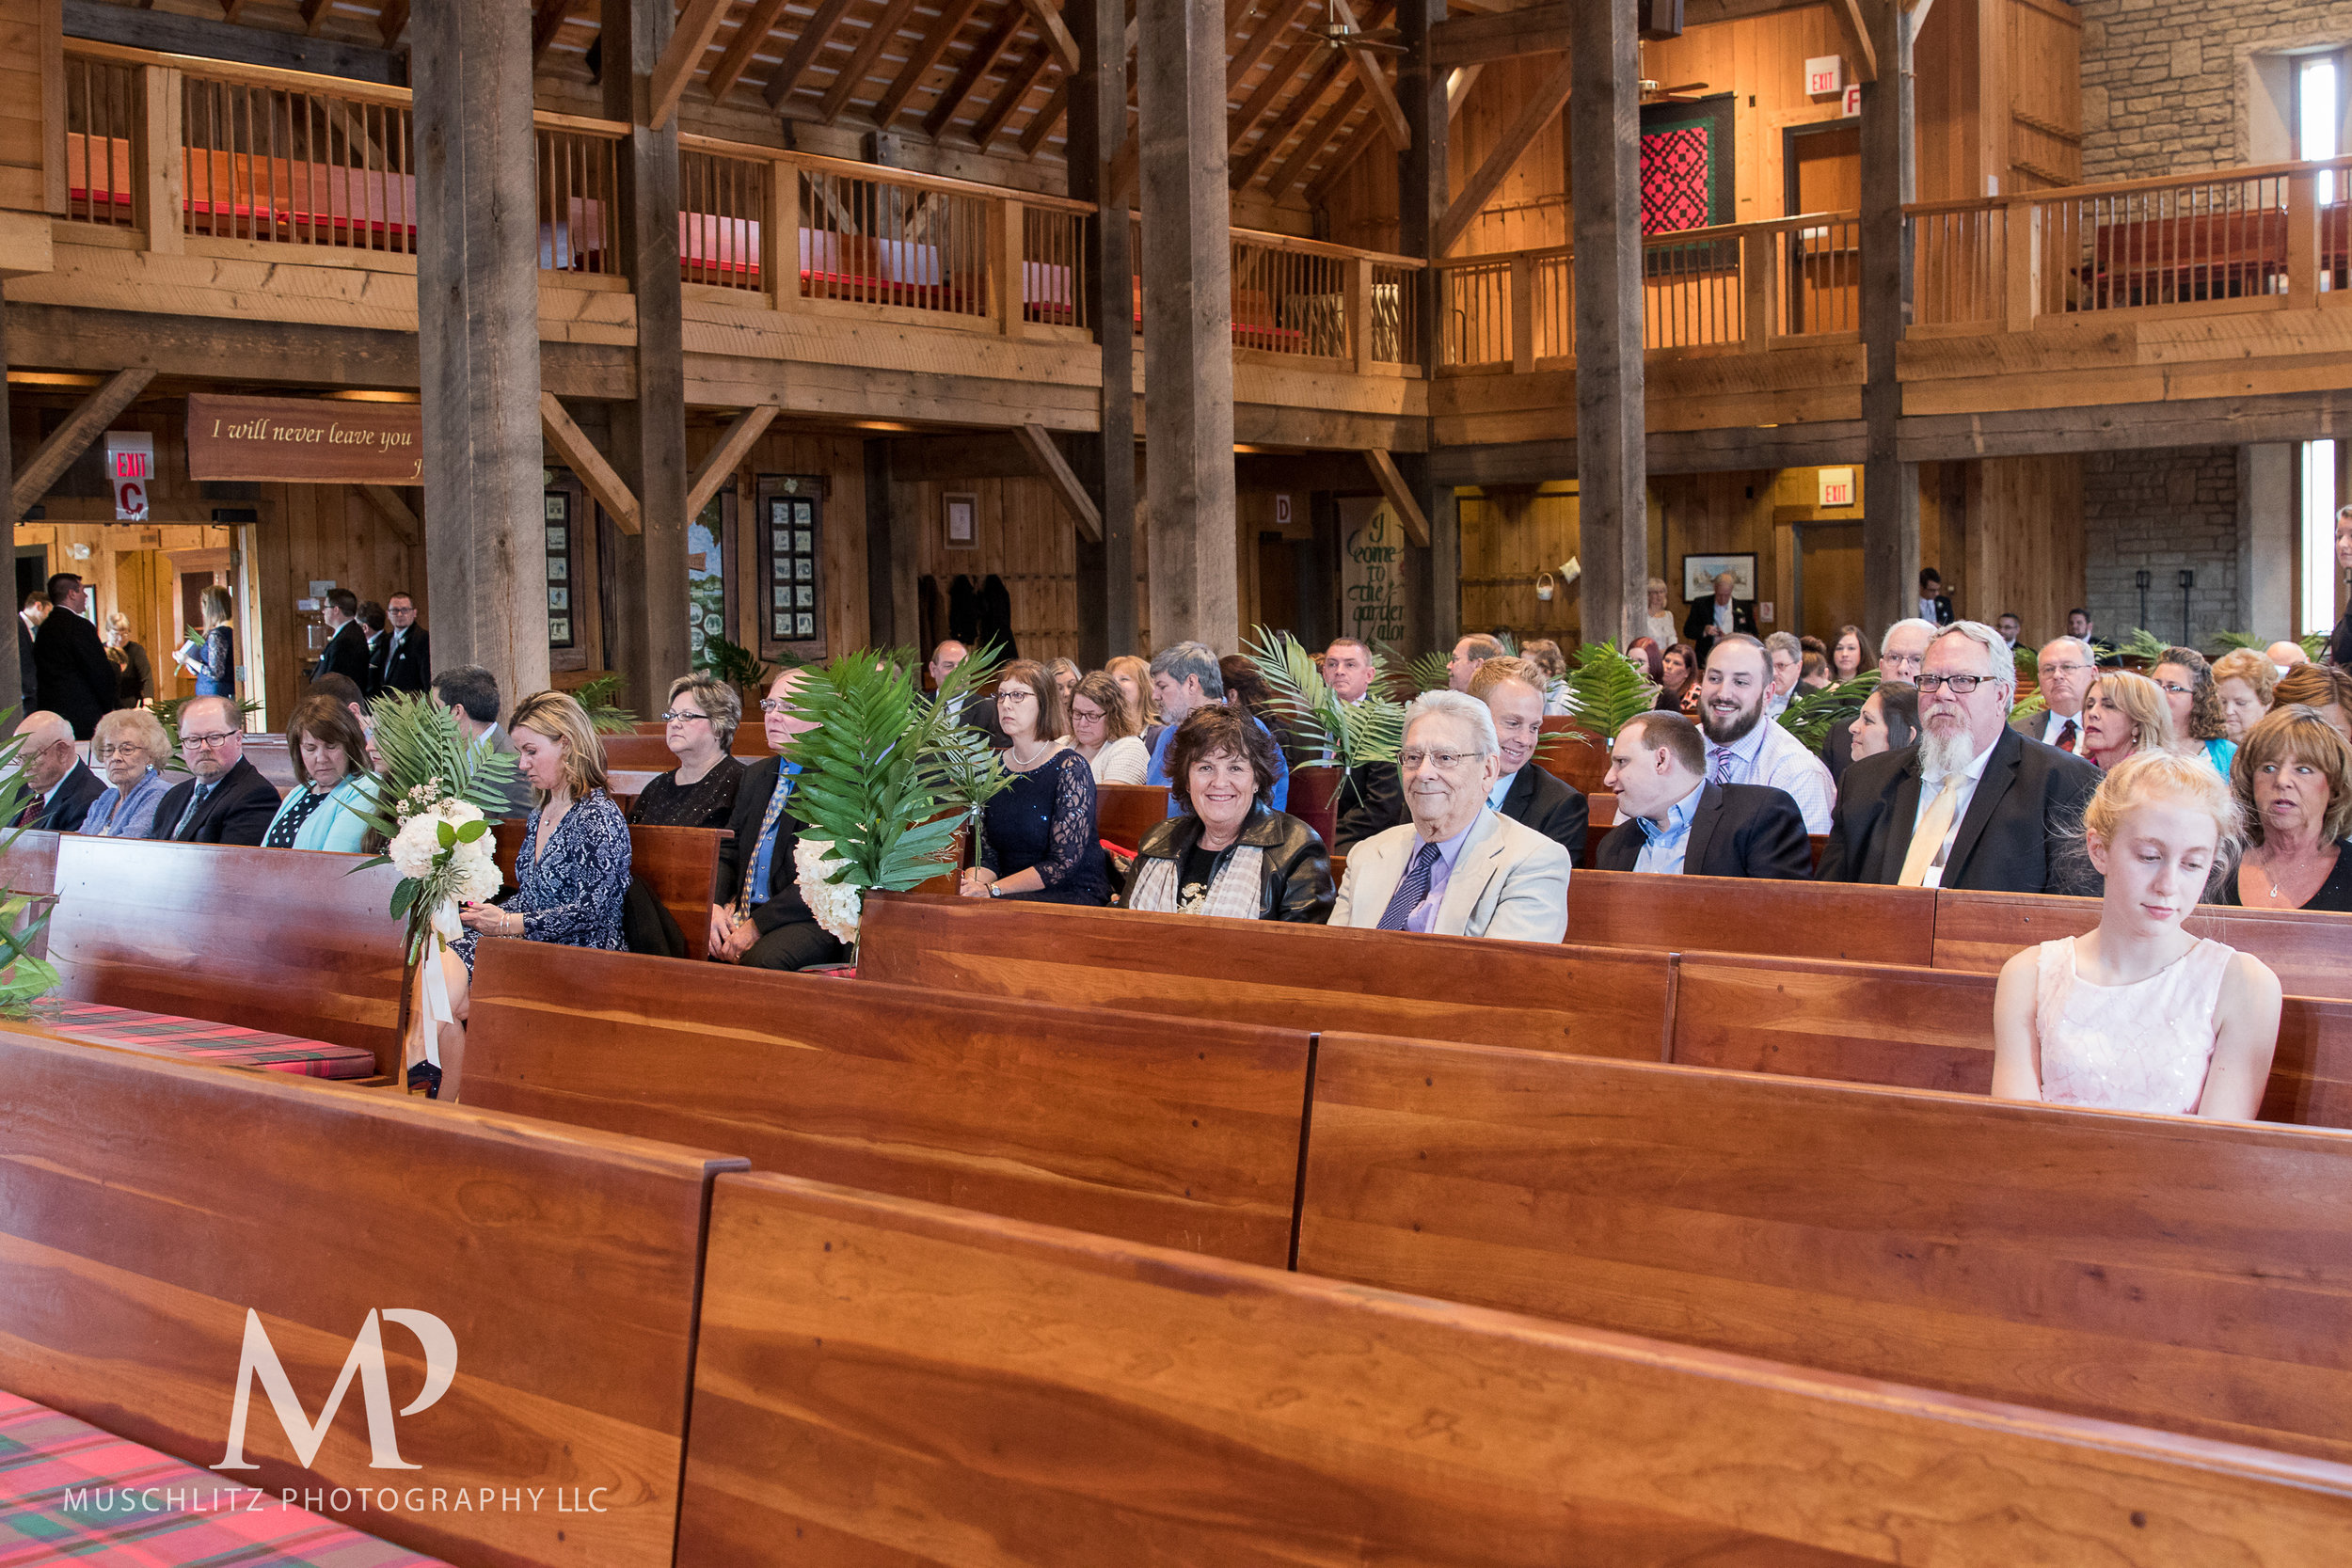 liberty-barn-presbyterian-church-wedding-delaware-columbus-ohio-muschlitz-photography-025.JPG